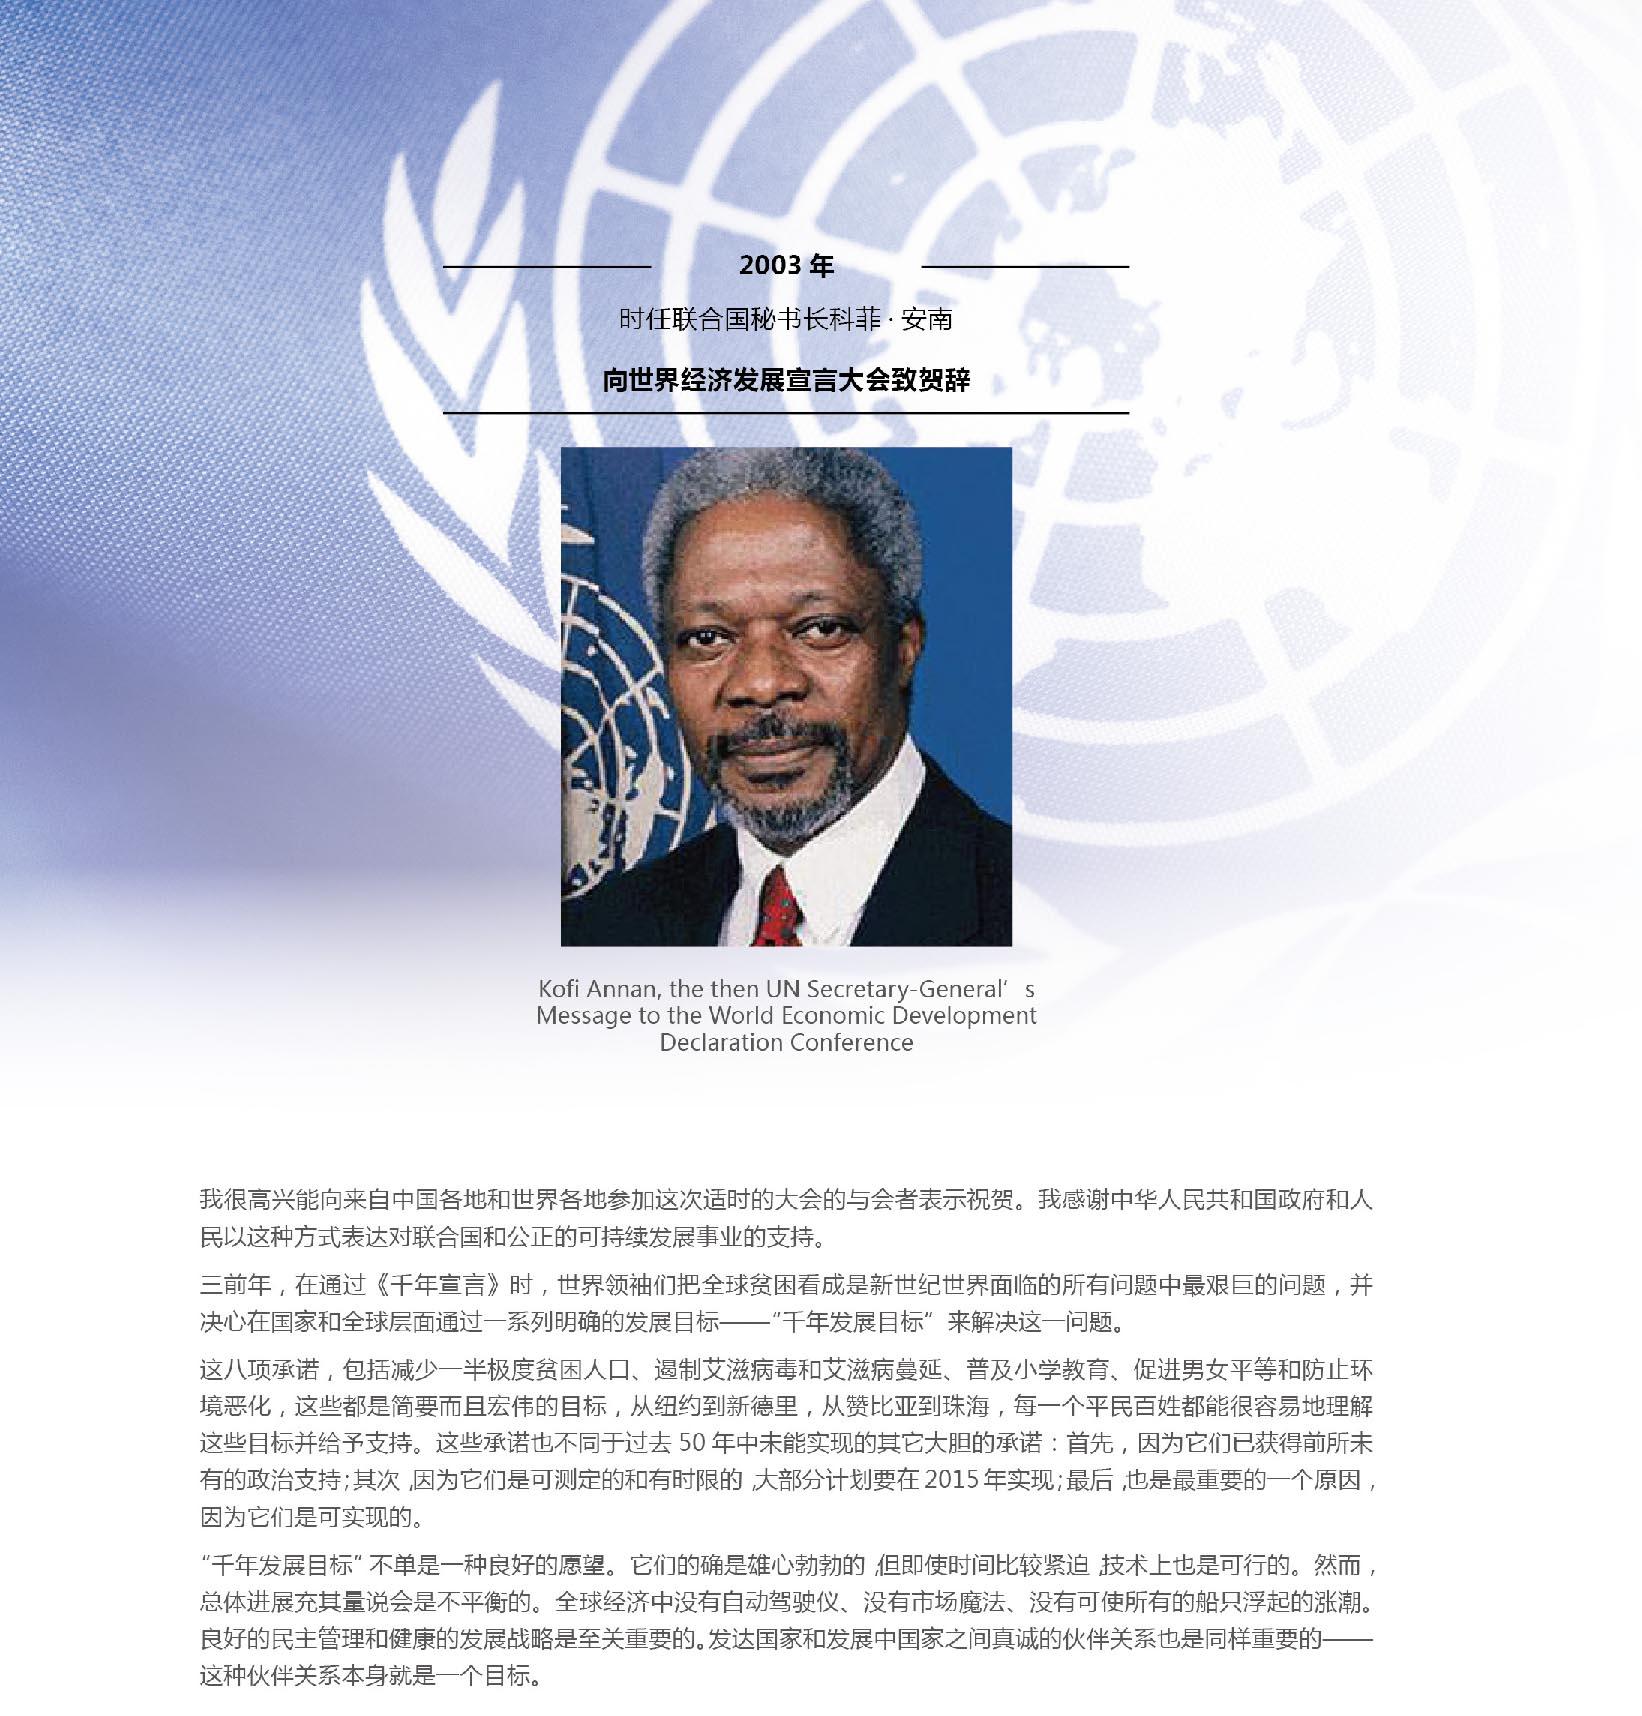 Kofi Annan, the then UN Secretary-General's Message to the World Economic Development Declaration Conference